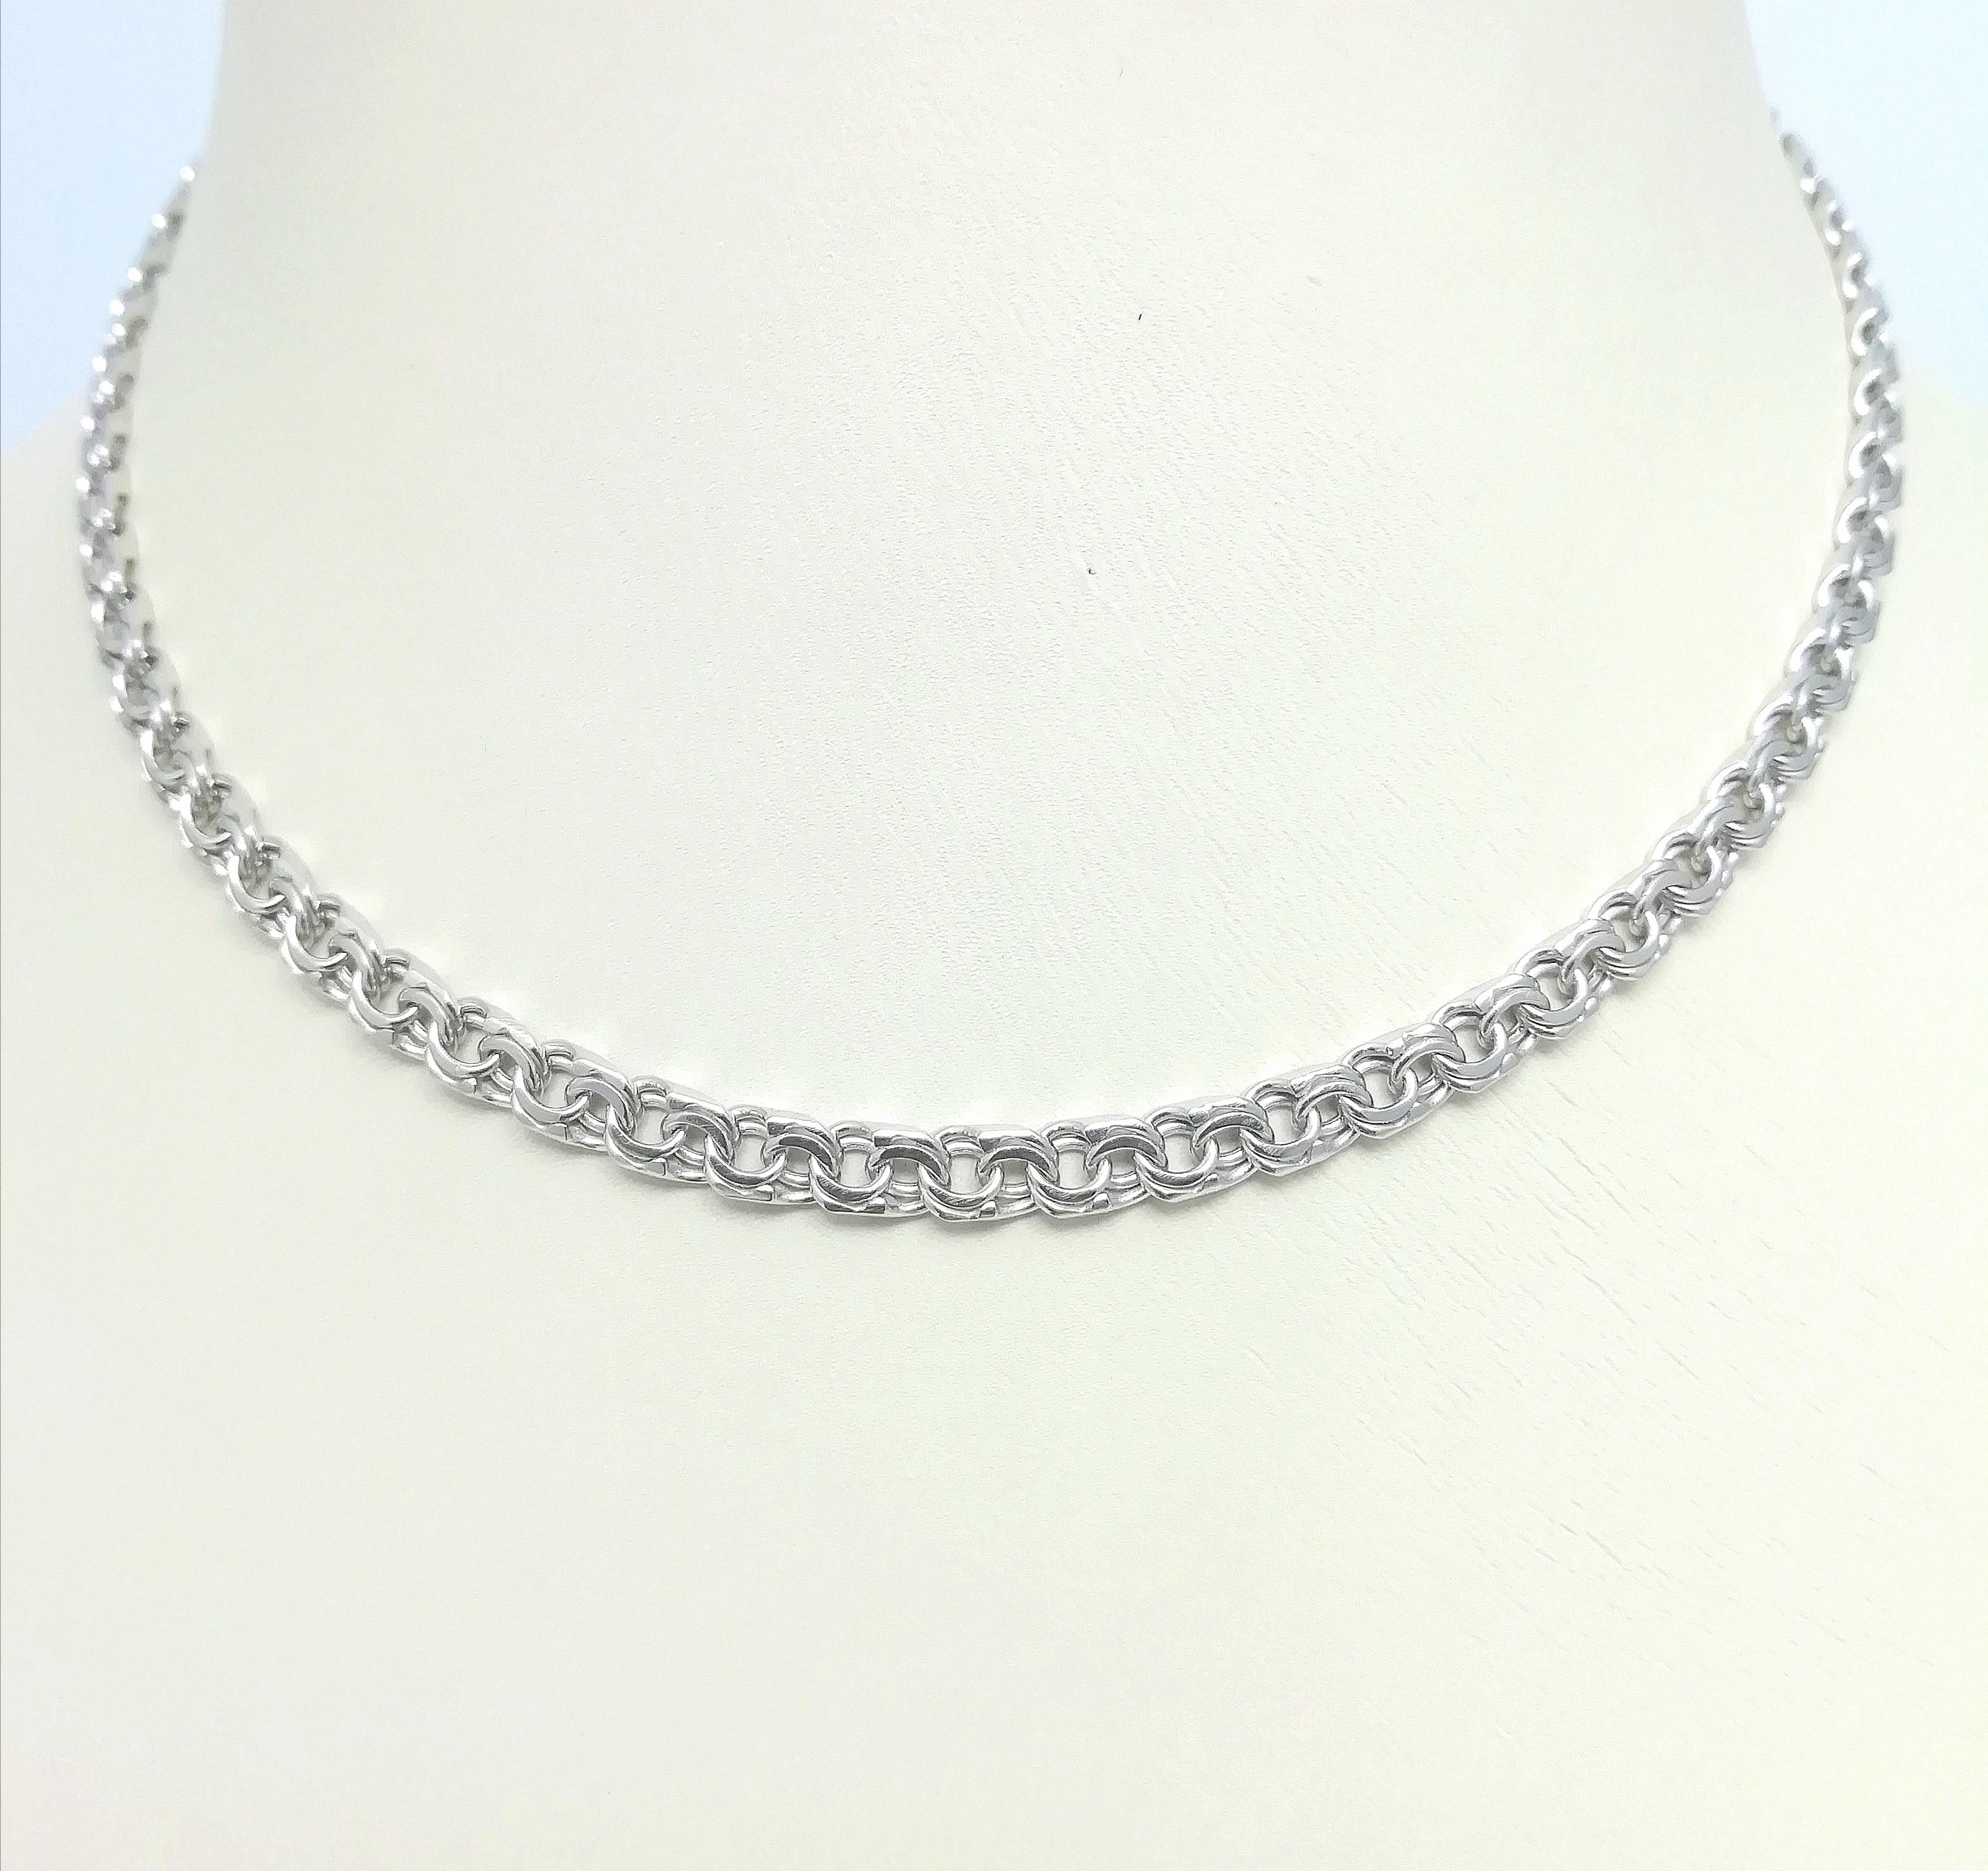 Серебро цепь дк240920-89 19,70гр